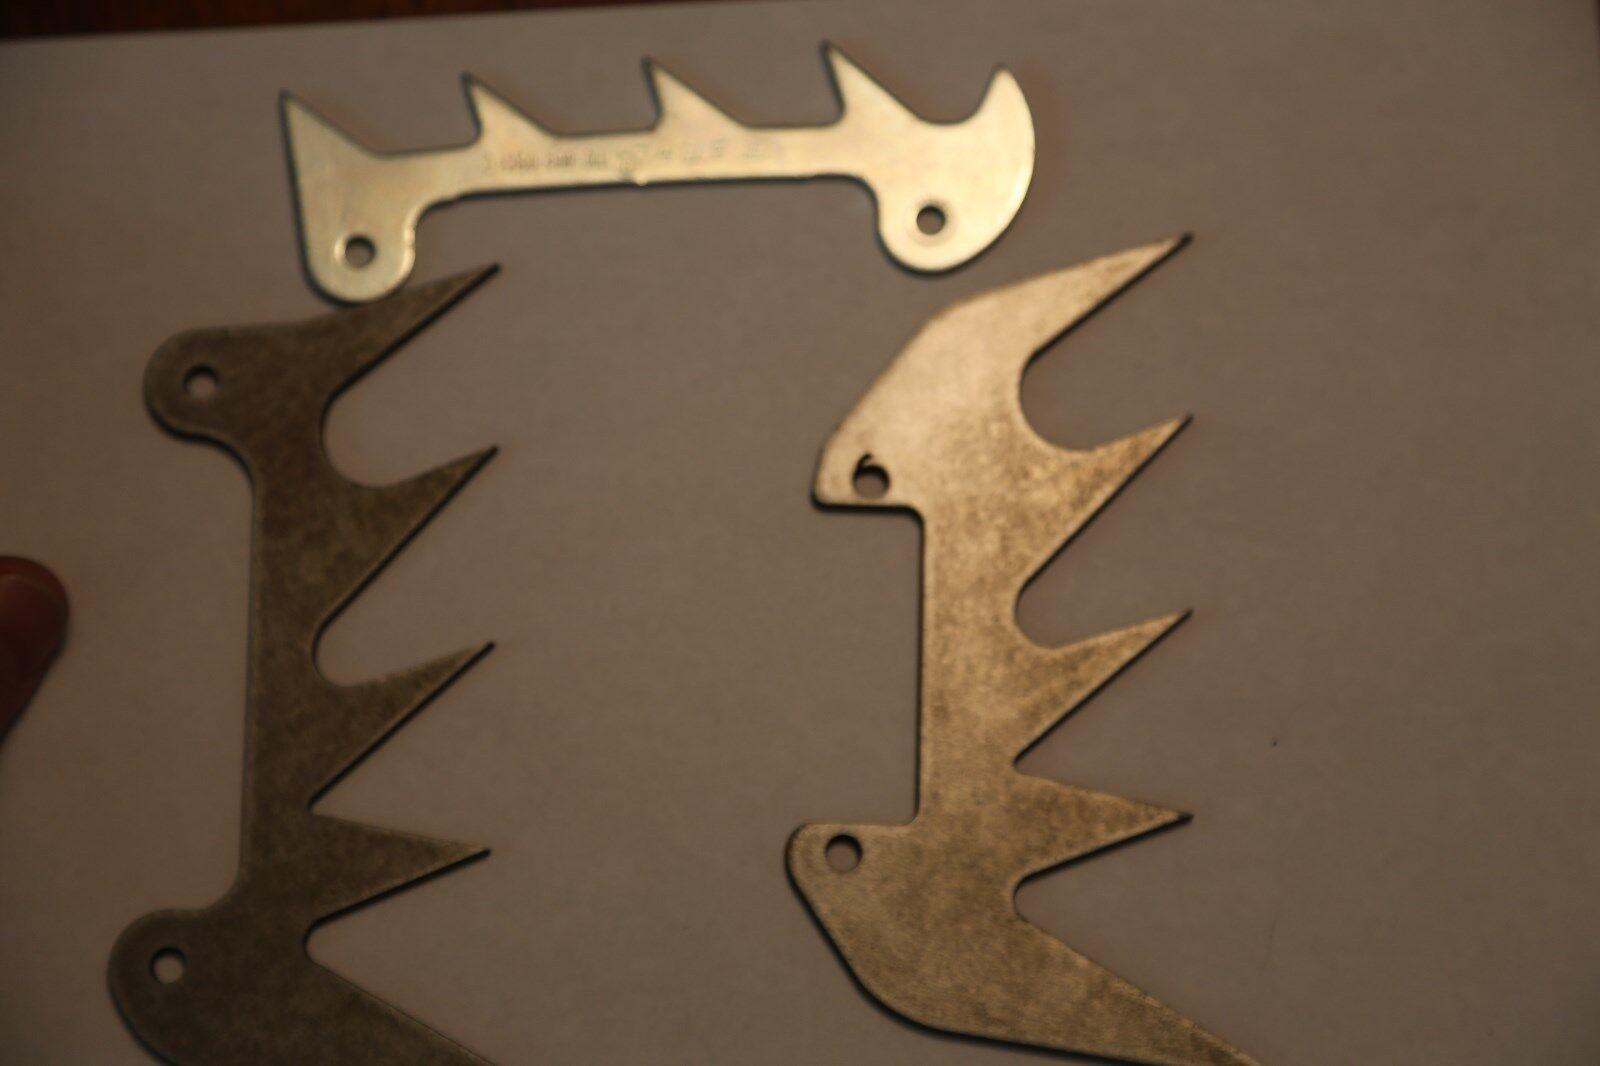 PILTZ Chainsaw TWIN Felling Dog SET Stihl MS260 thru MS391 Improved 10-10-16